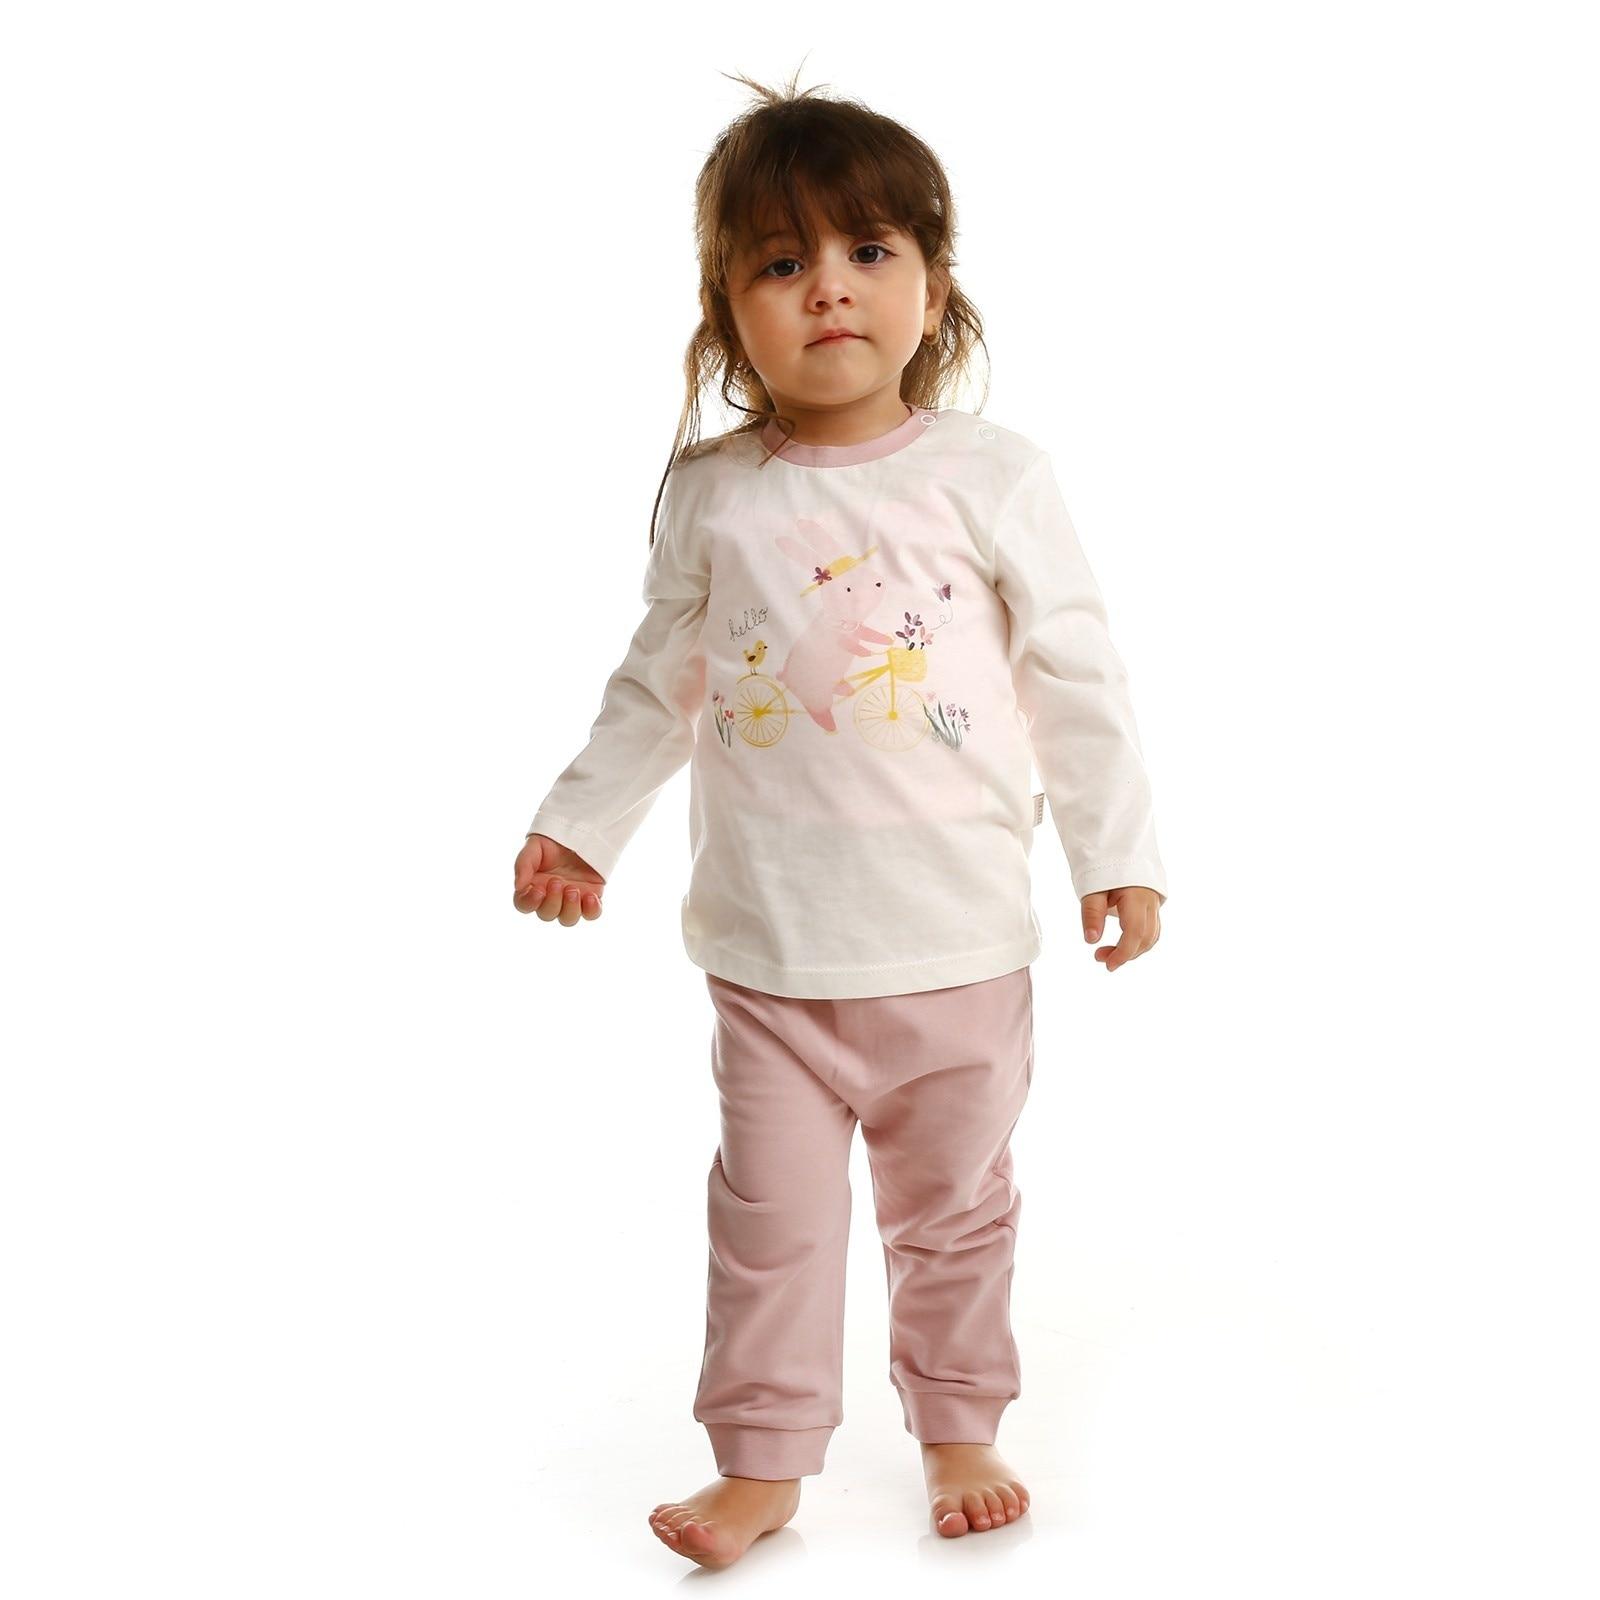 Ebebek Bebbek Summer Baby Girl Hello Supreme Crew-Neck Sweatshirt Pant 2 Pcs Set